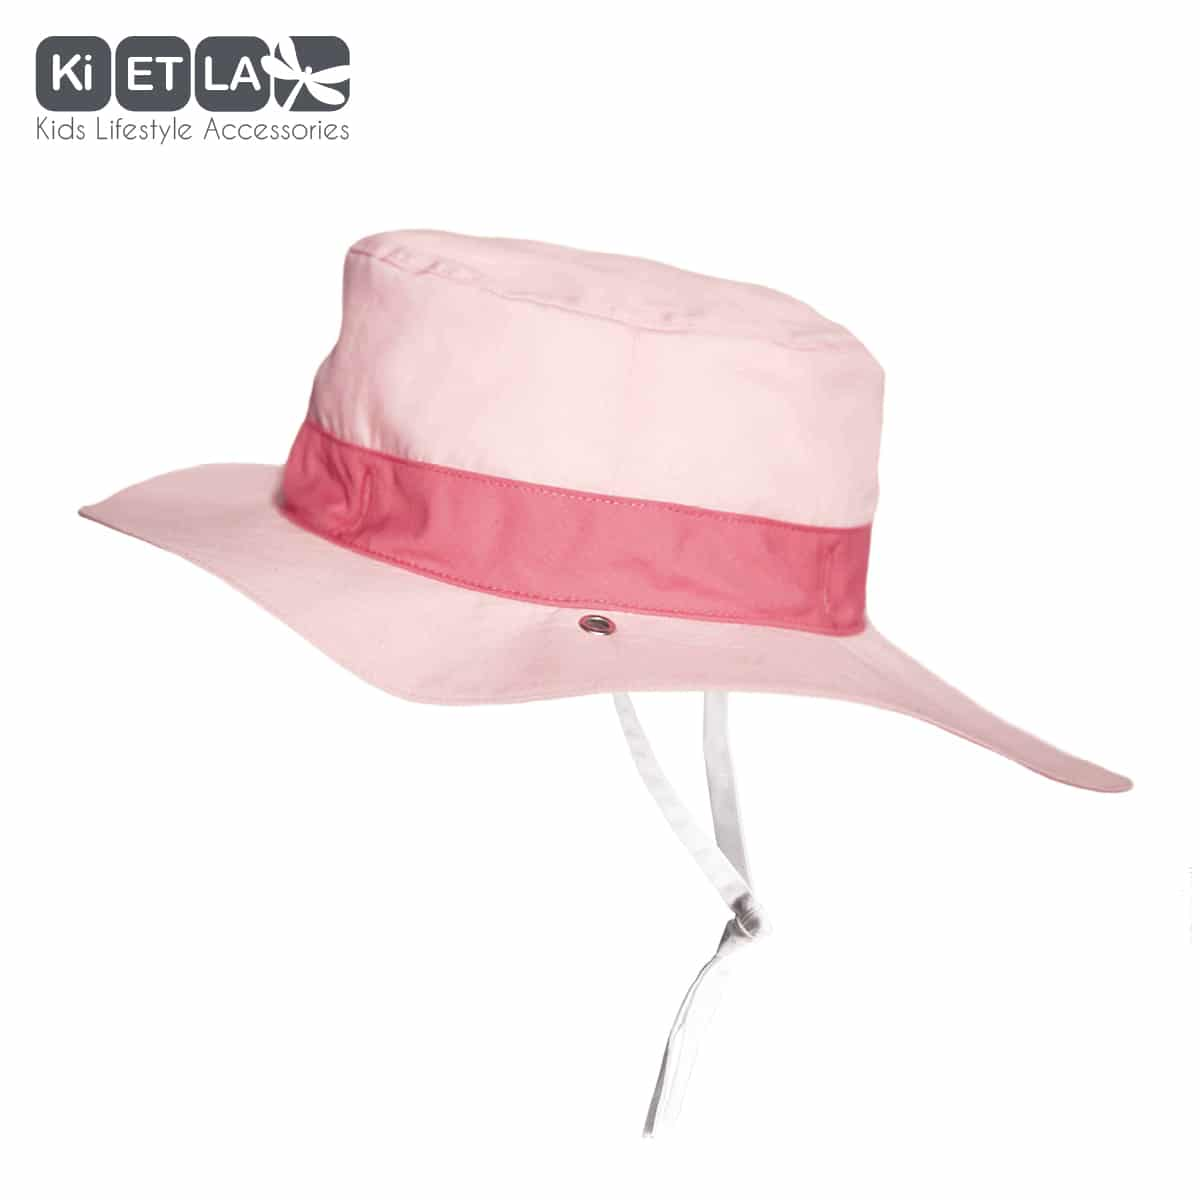 KiETLA  obojstranný klobúčik s UV ochranou - 47cm